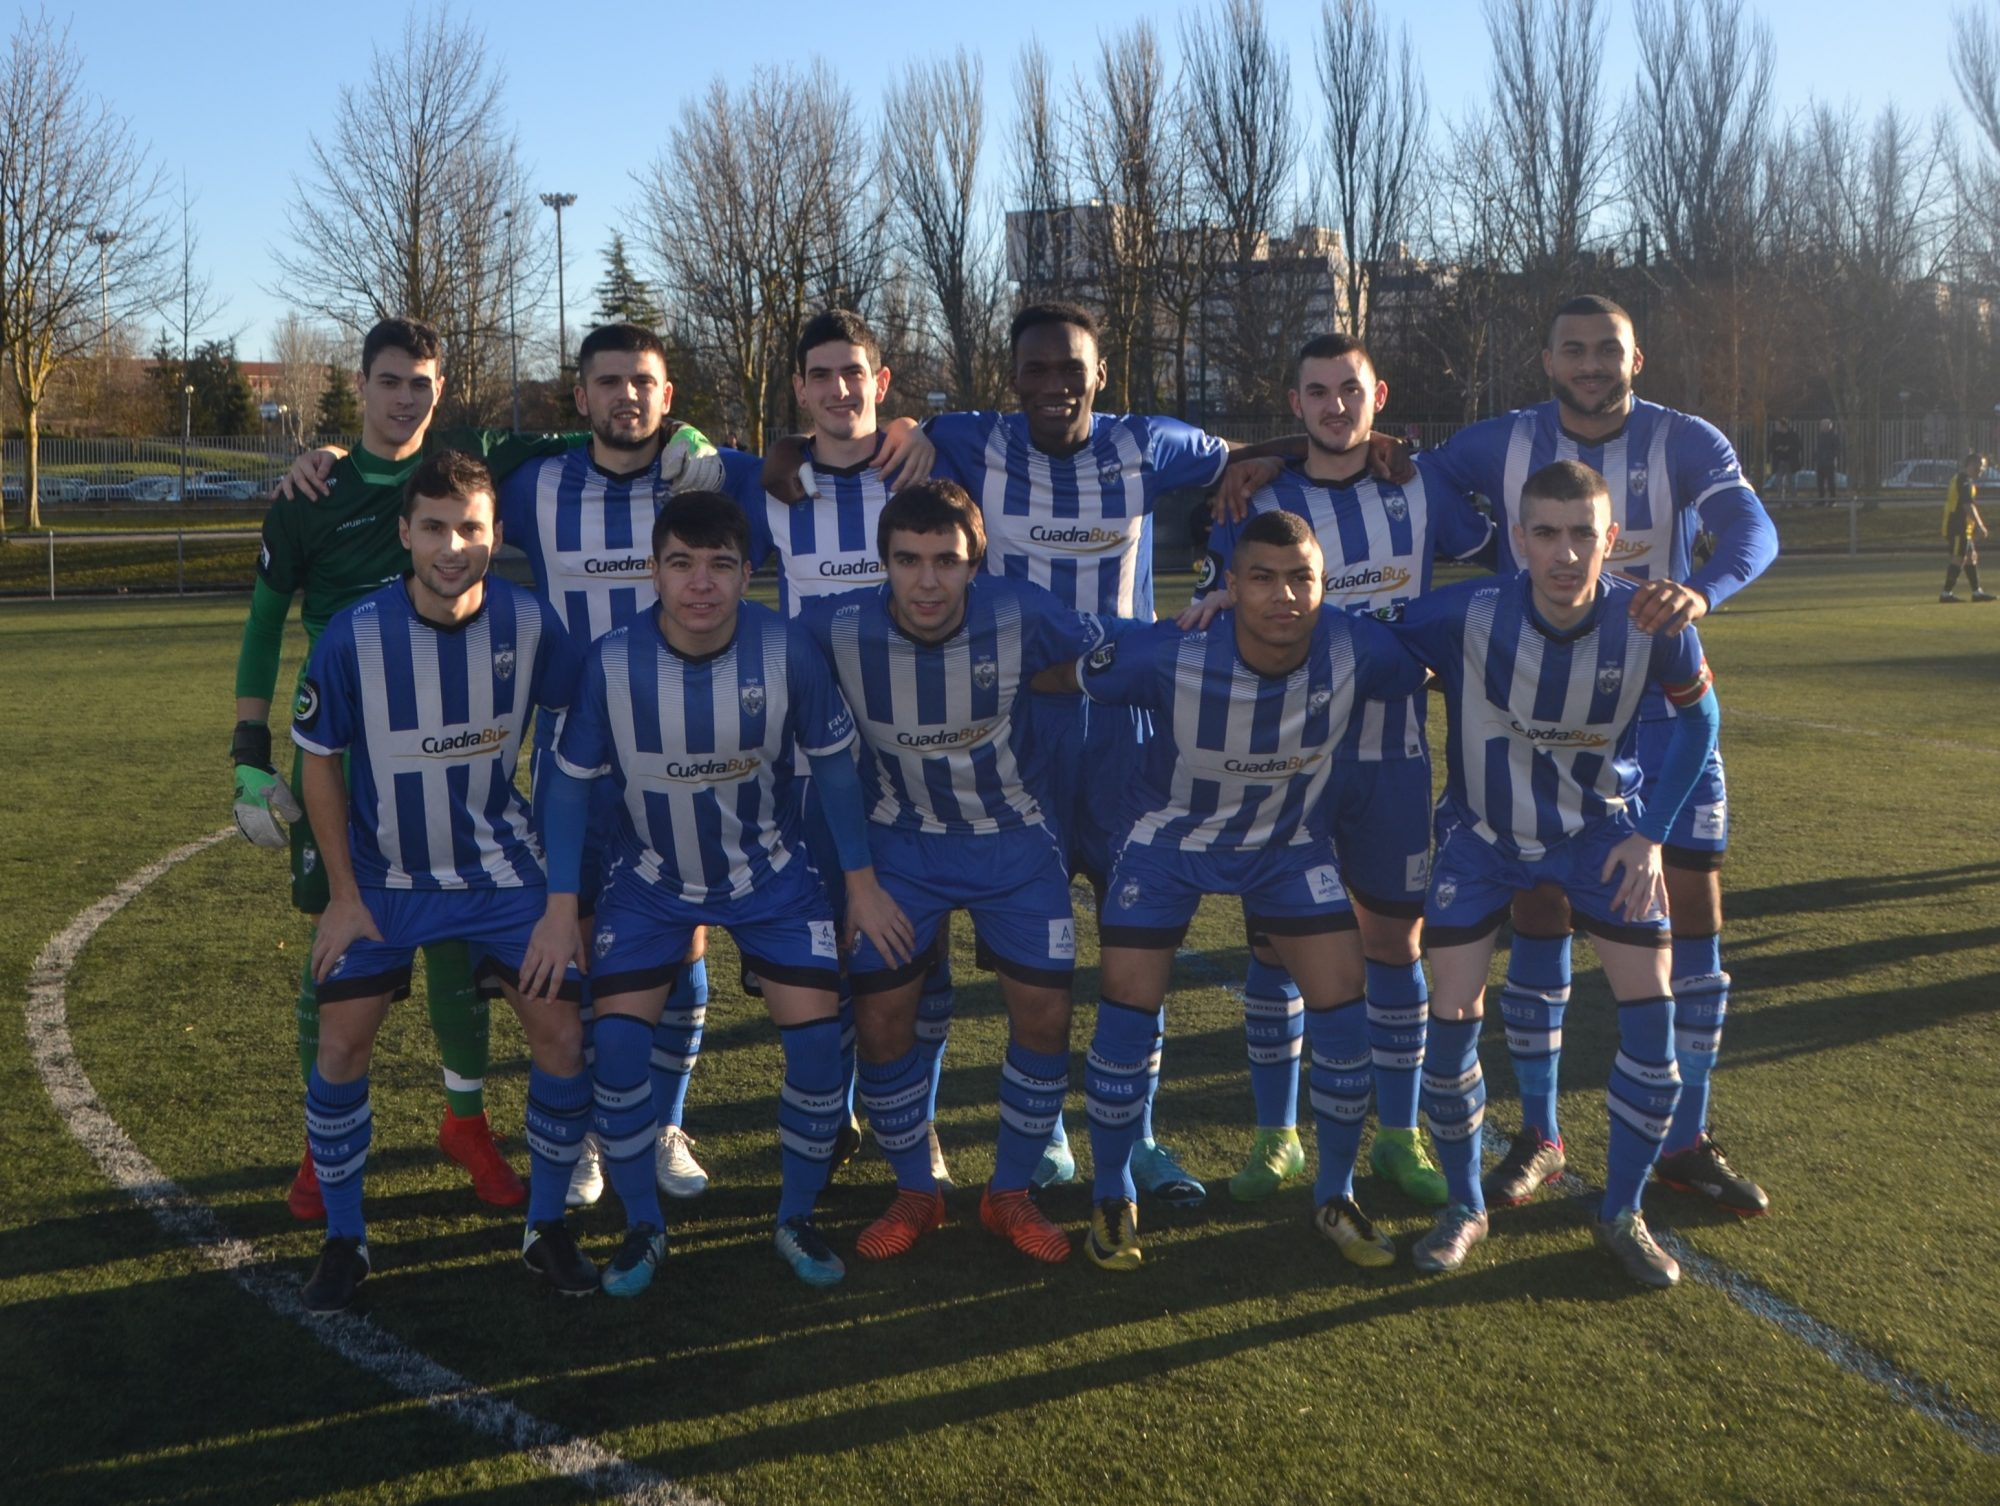 AMURRIO CLUB (11-01-2020)